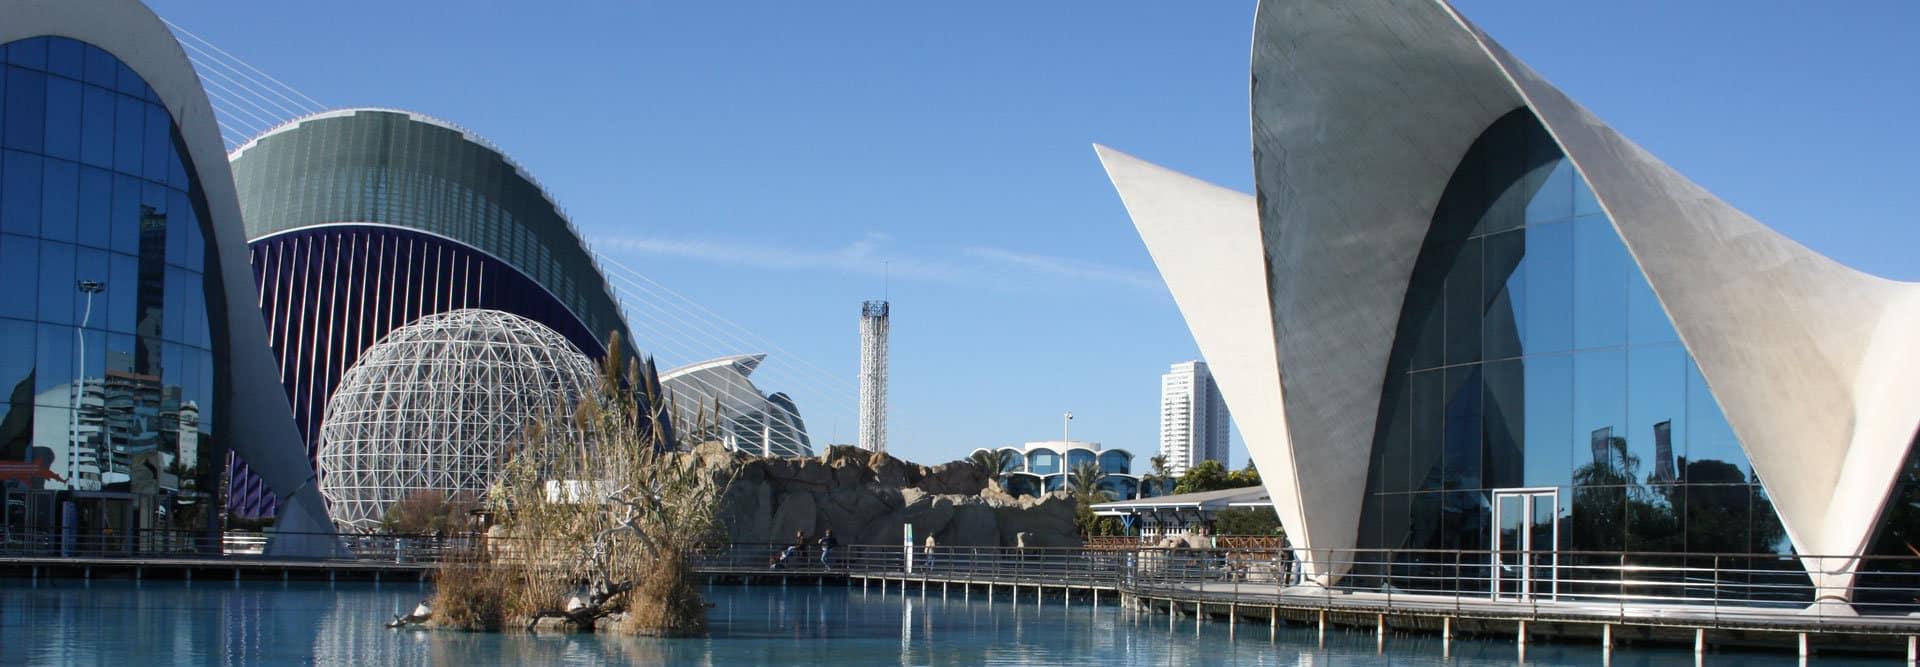 Oceanografic-Valencia-experiences-and-gateways